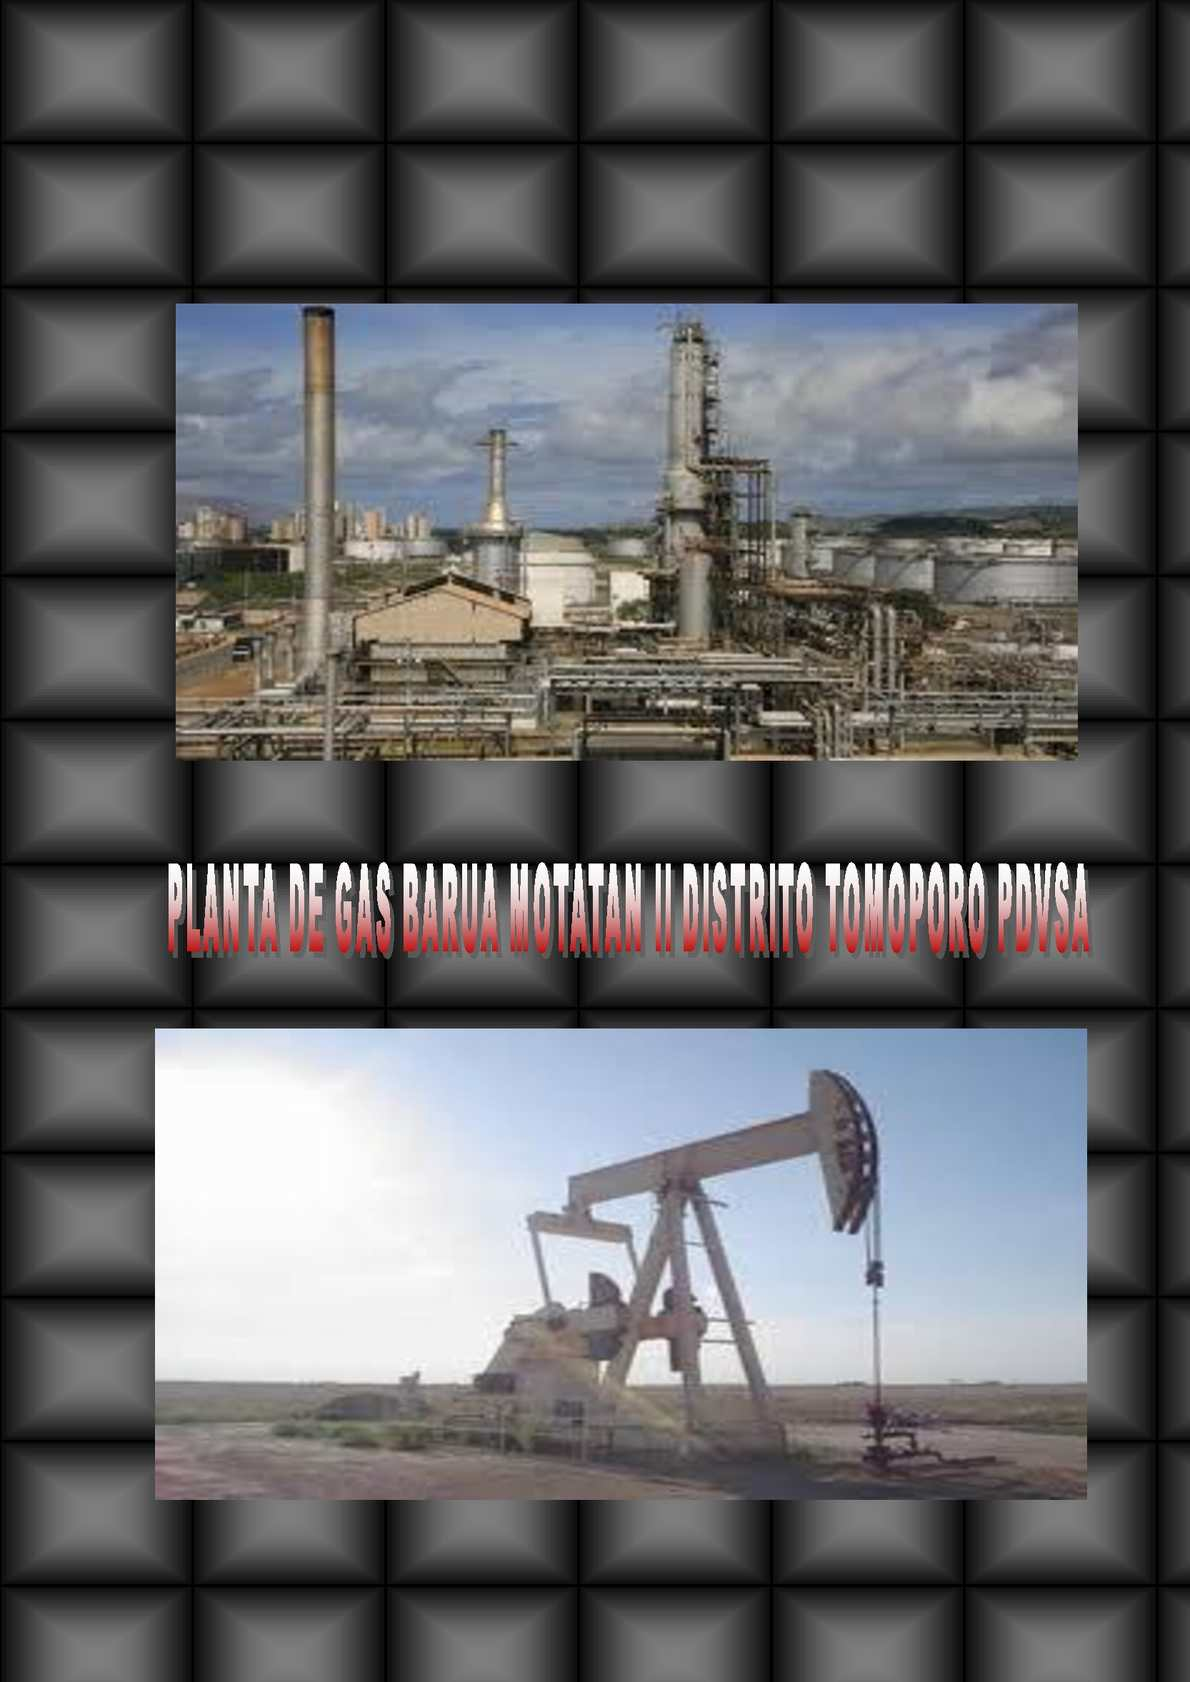 Planta de Gas Barua Motatan II Distrito Tomoporo